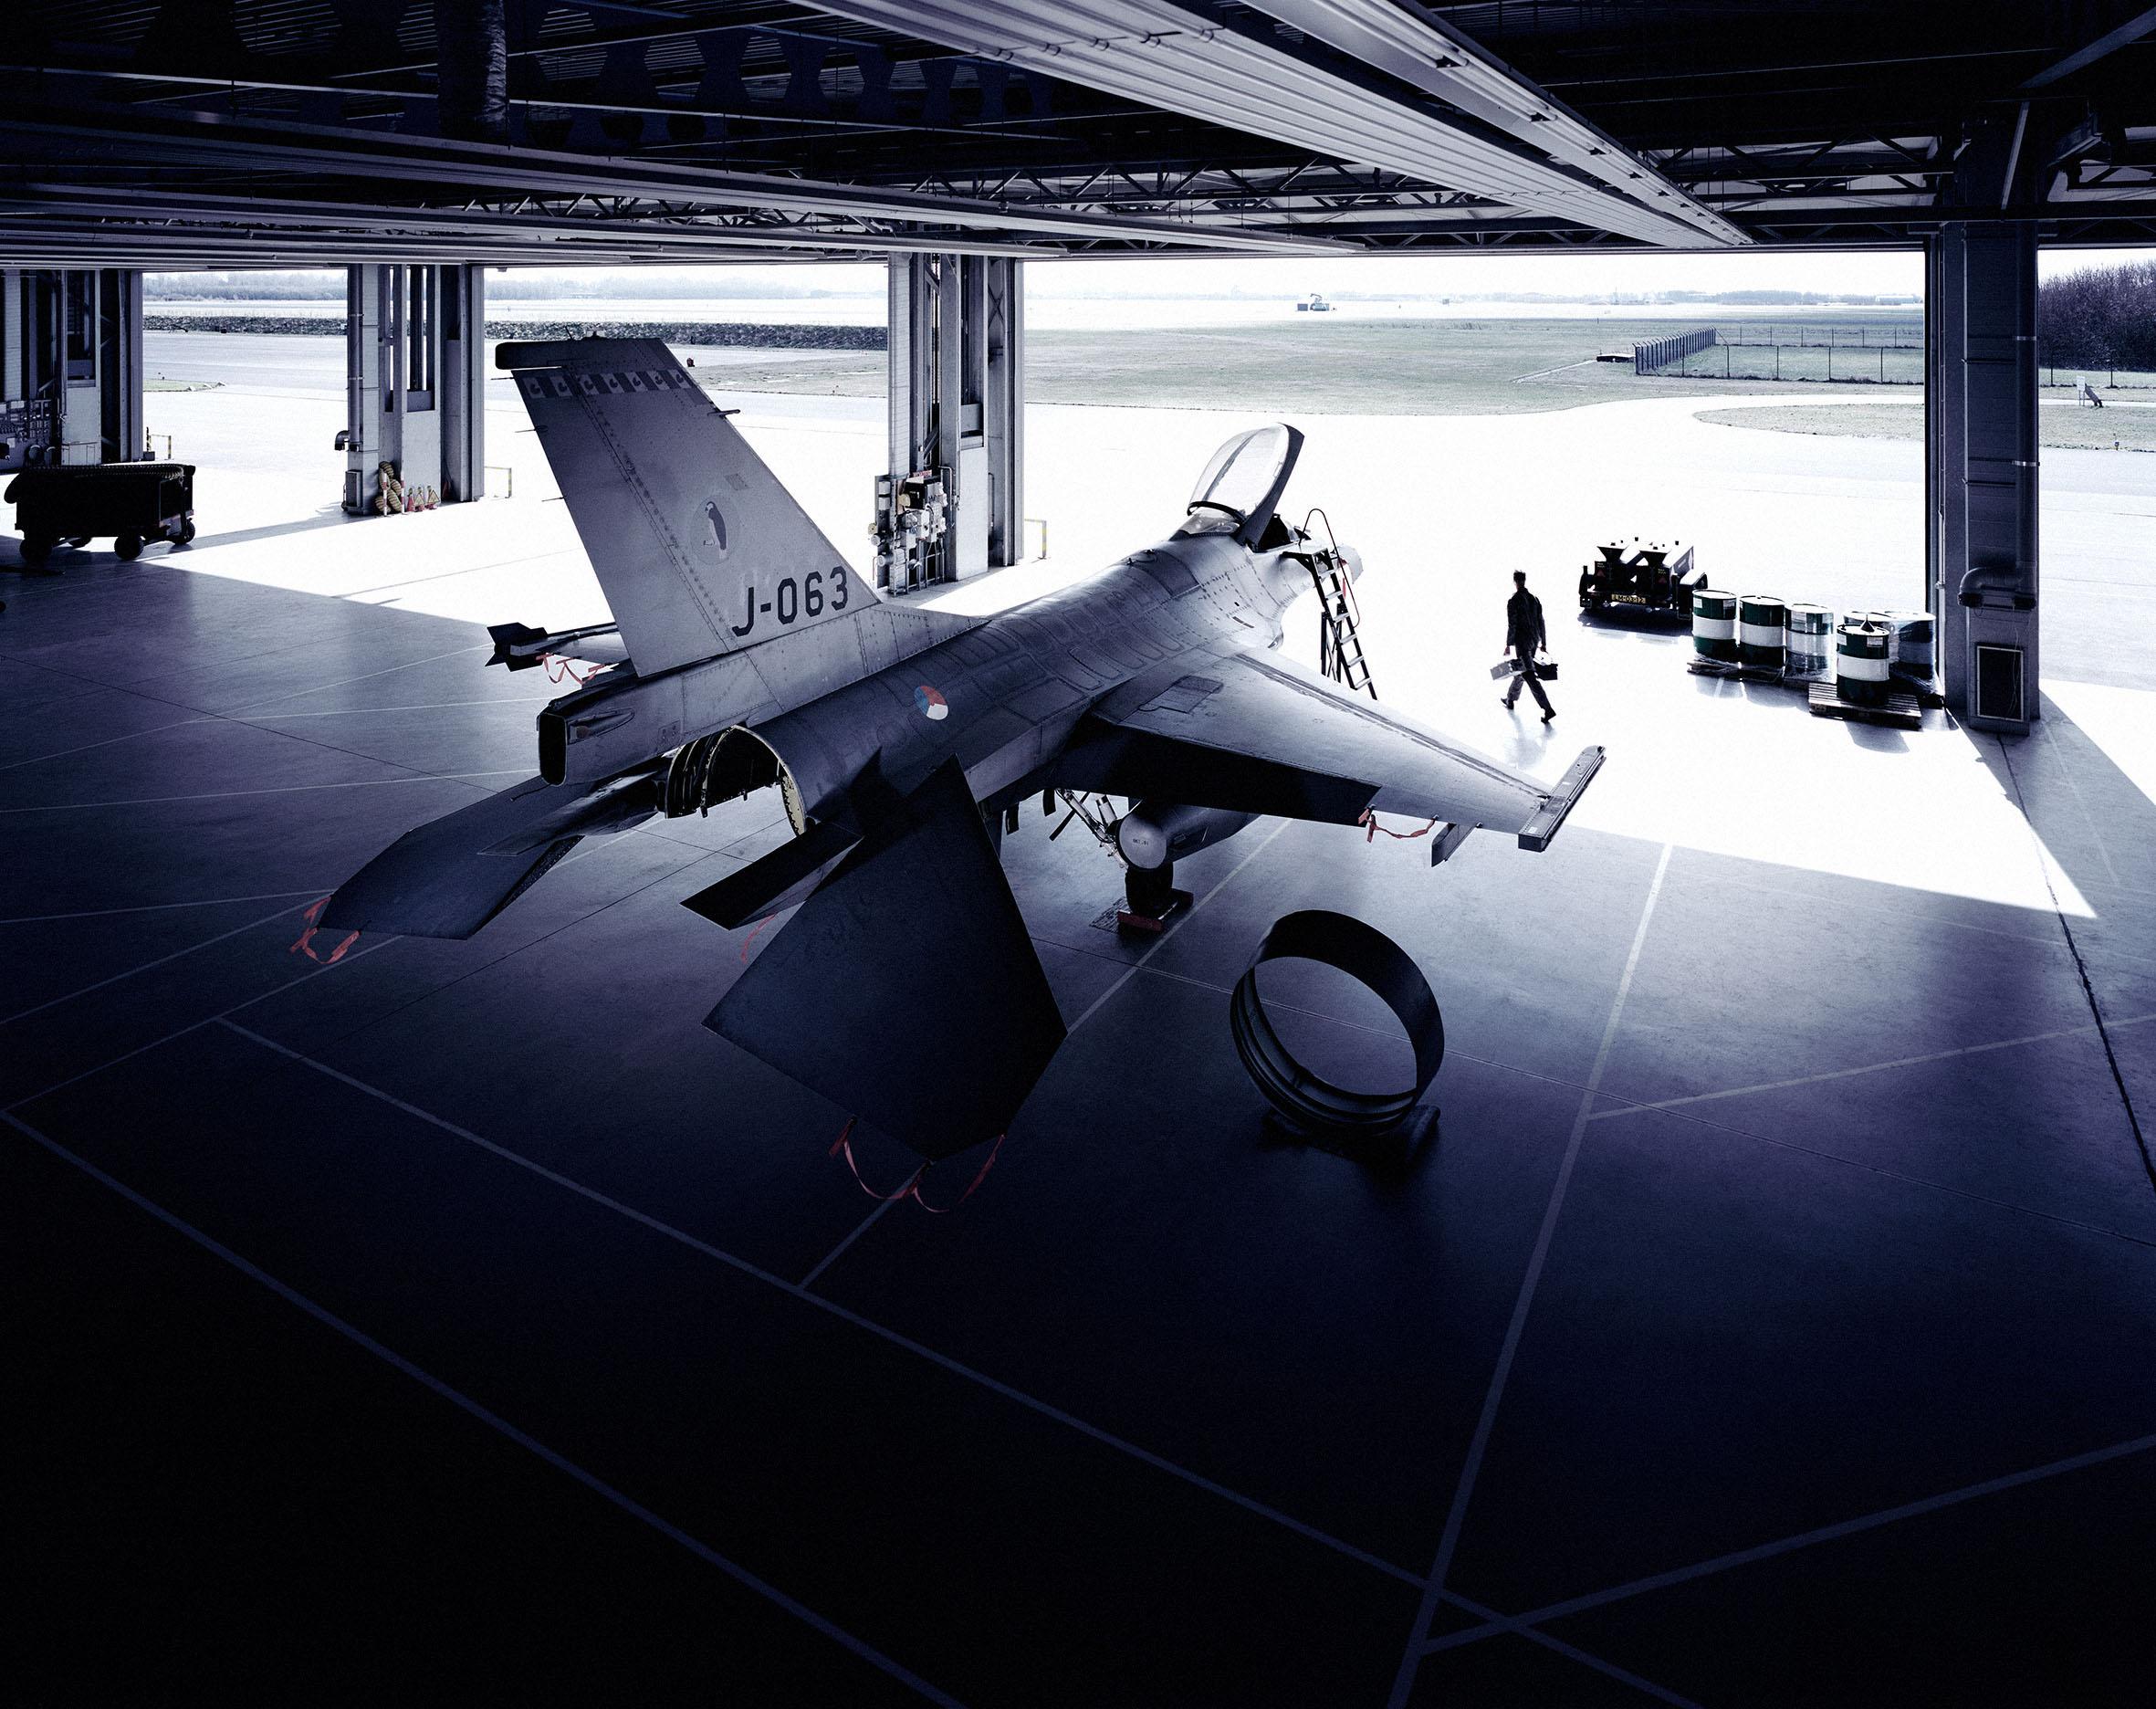 ARA Luchtmacht